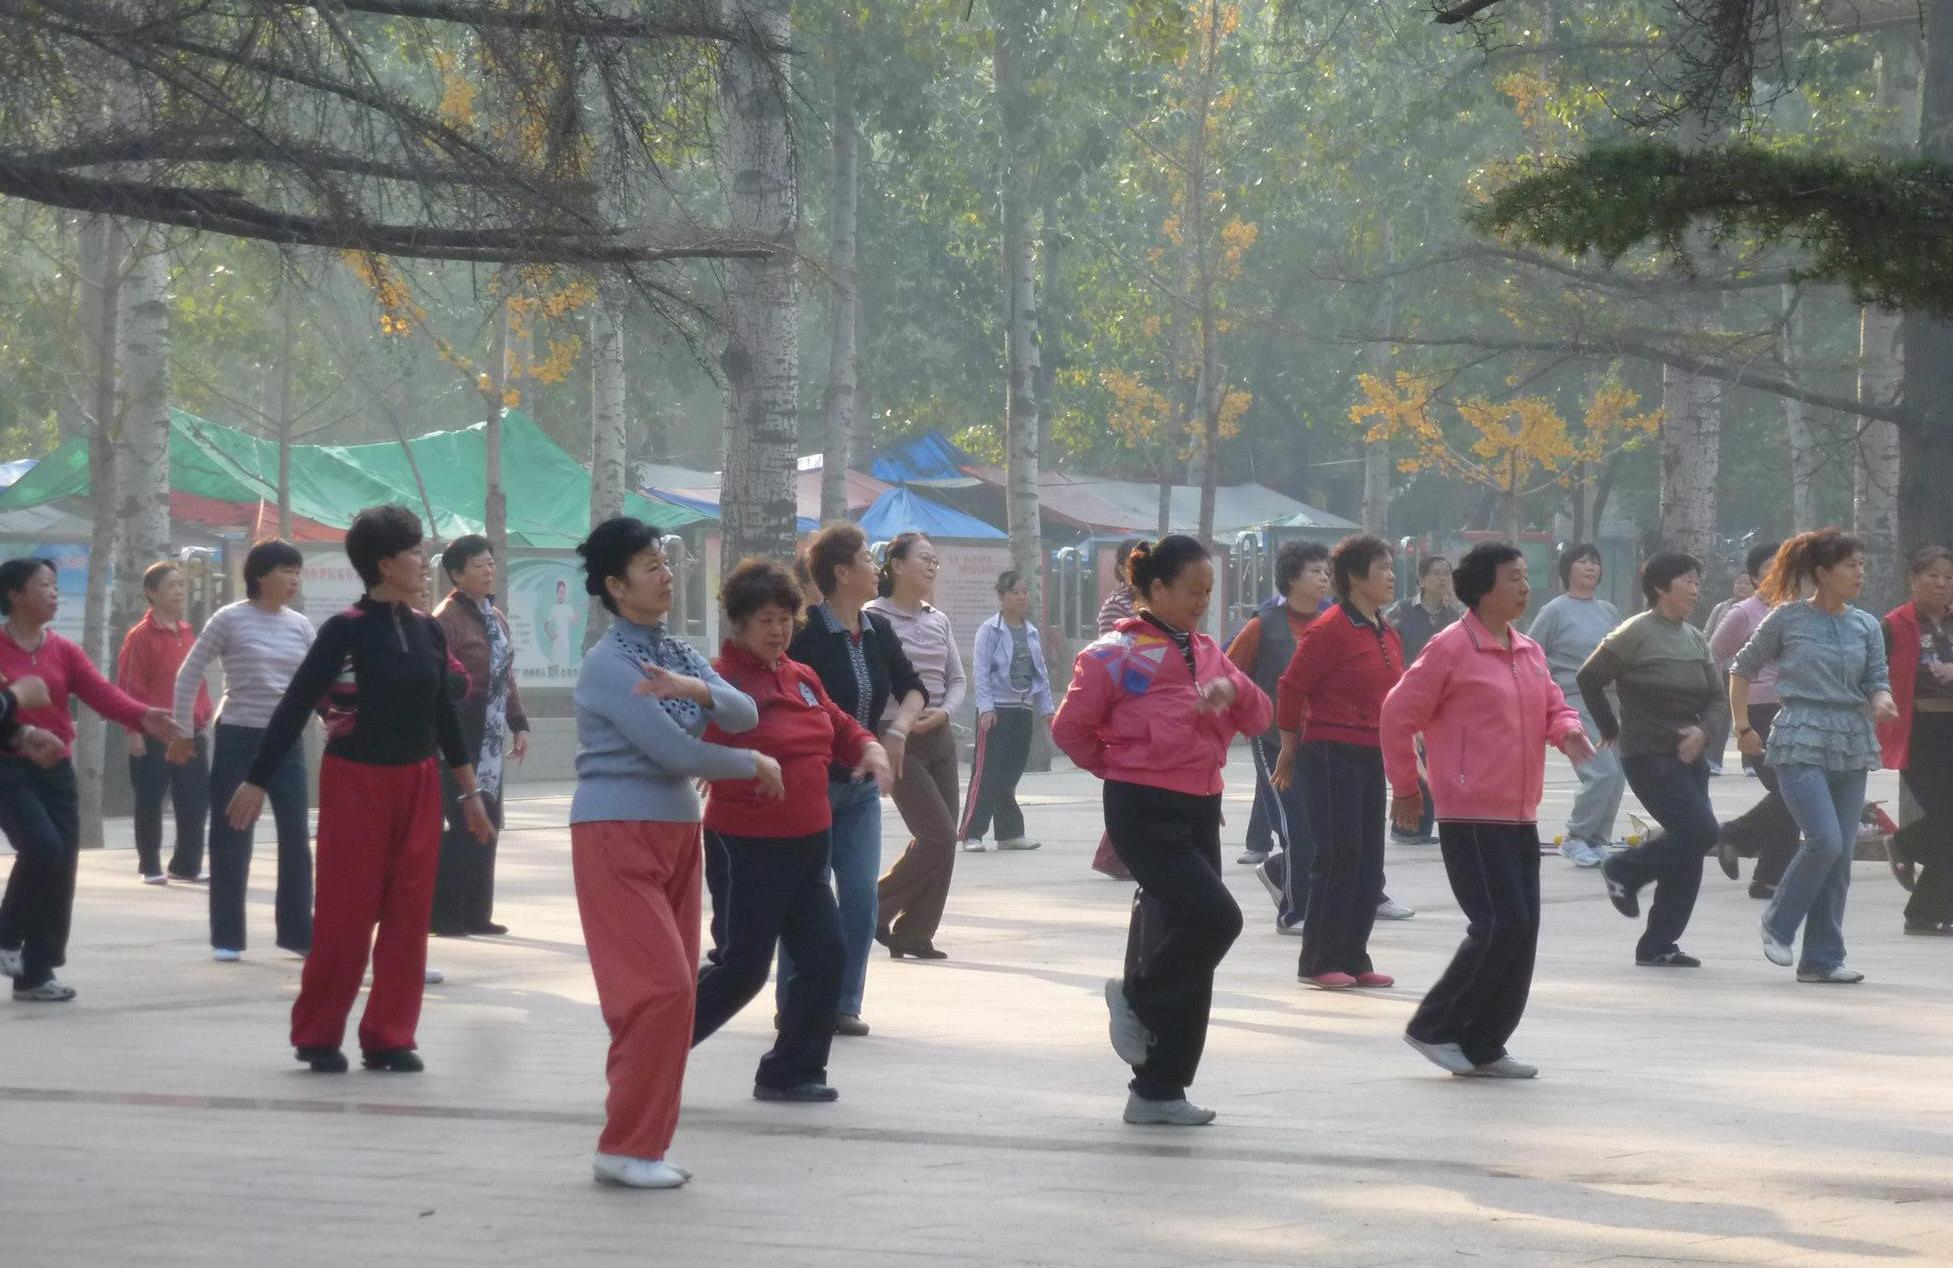 Throughout China women gather to exercise